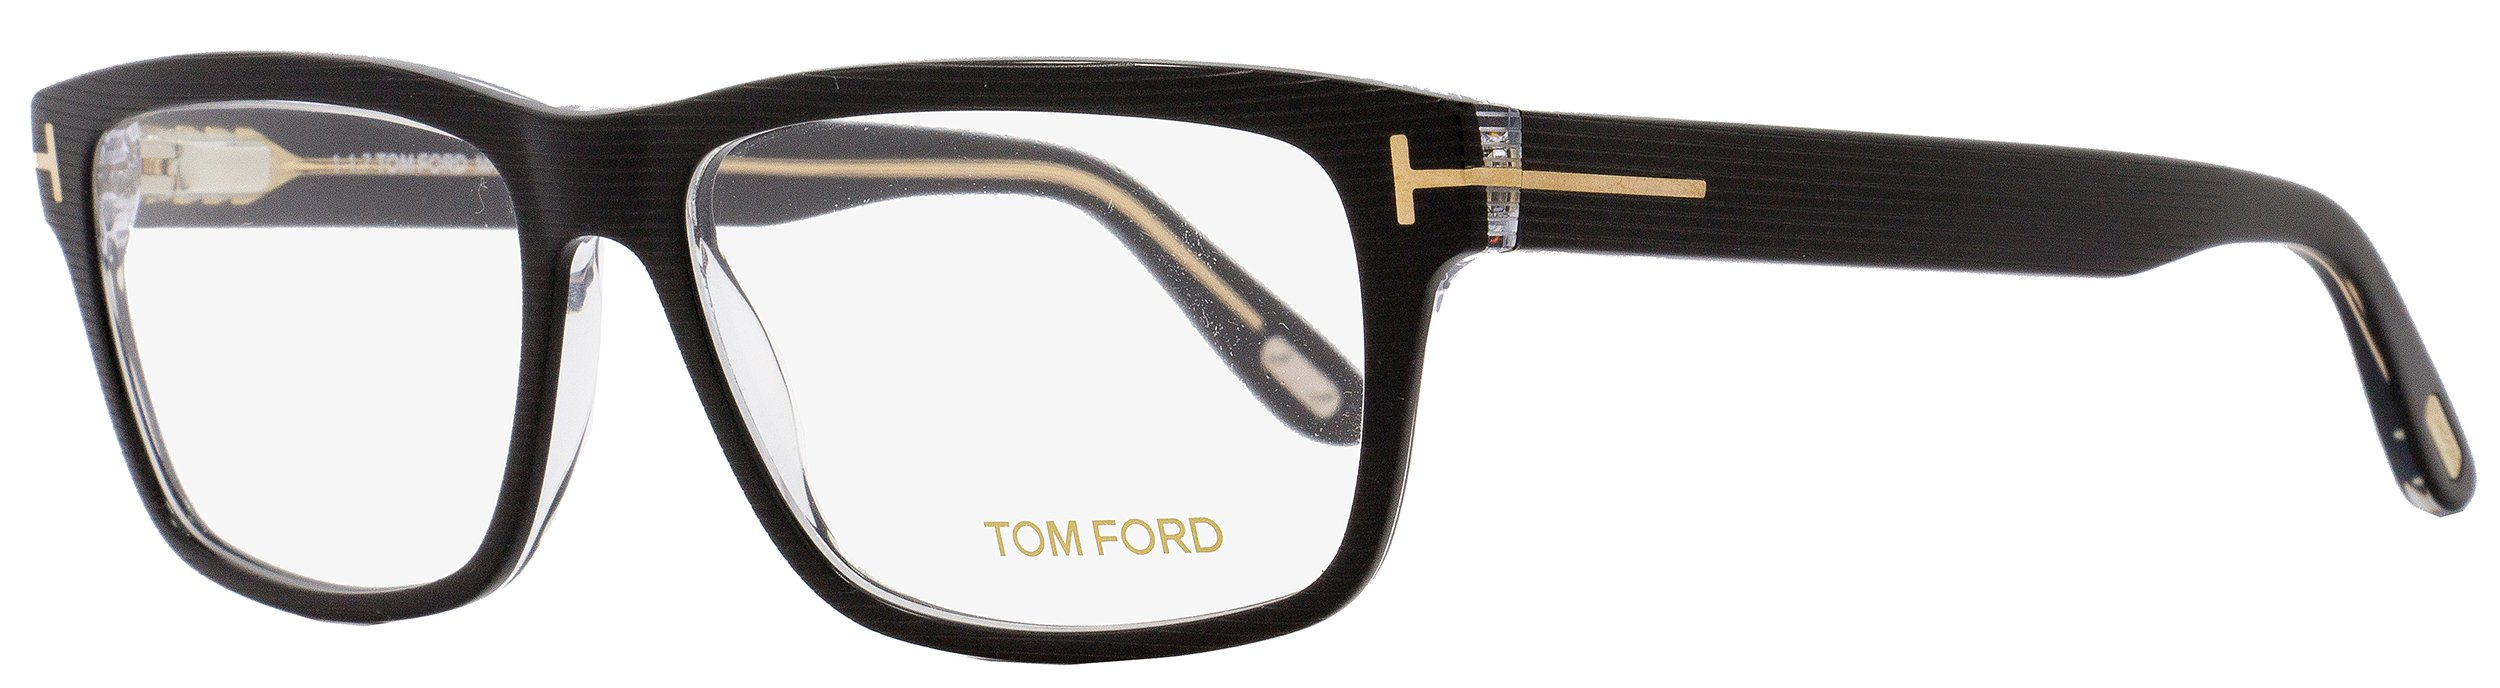 New Tom Ford Eyeglasses Men TF 5320 Black 005 TF5320 56mm